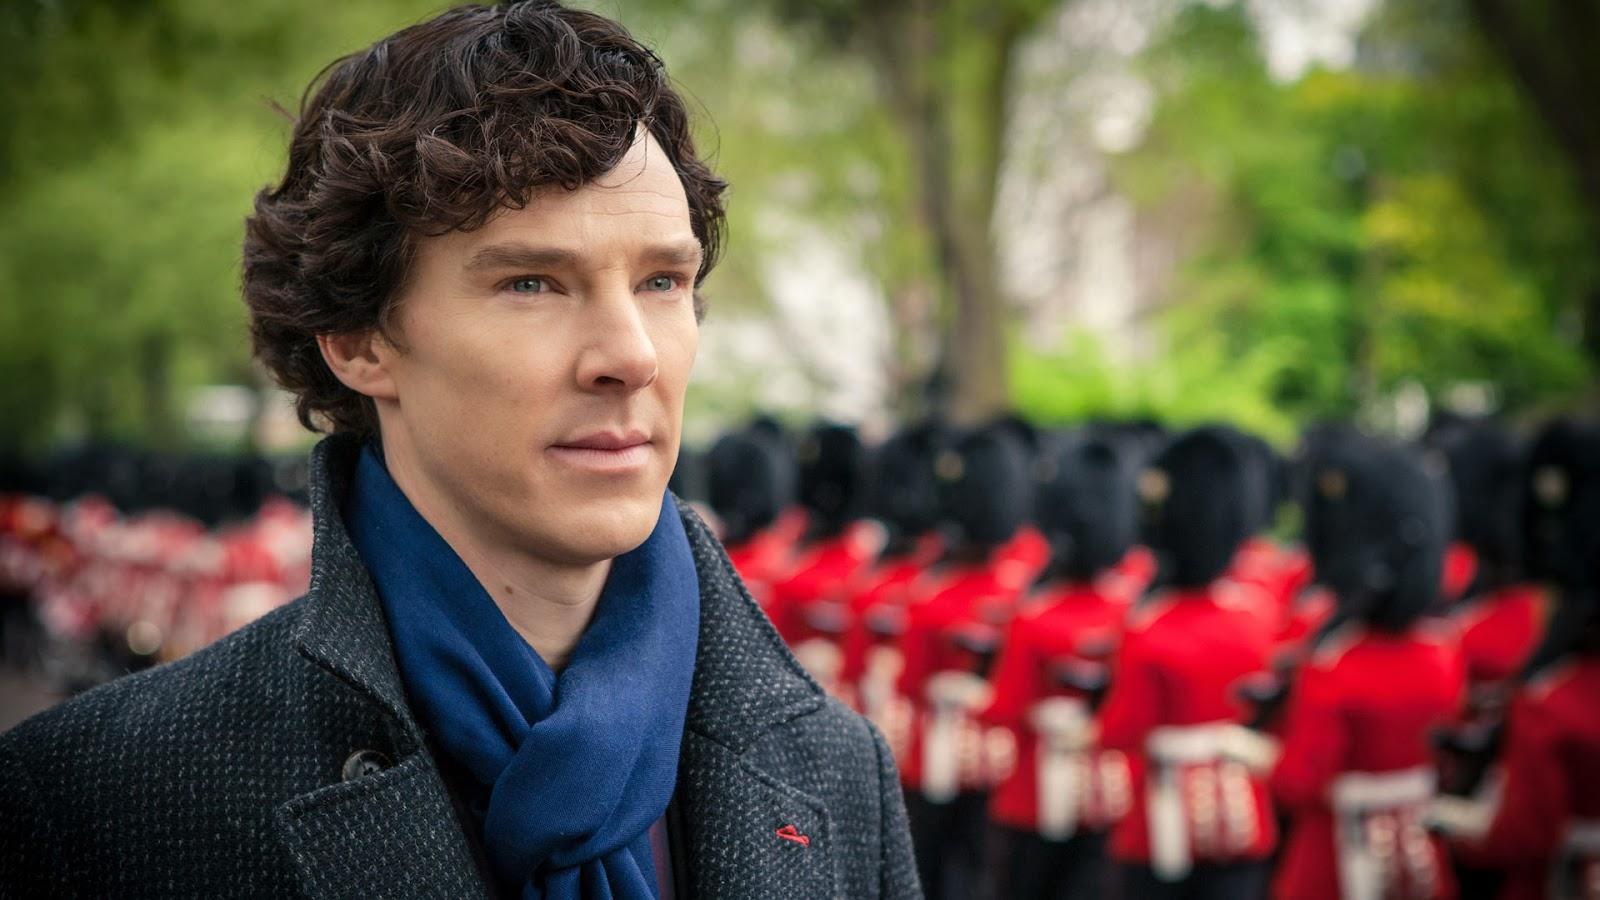 benedict-cumberbatch-as-sherlock-holmes-in-bbc-sherlock-season-3-episode-2-the-sign-of-three